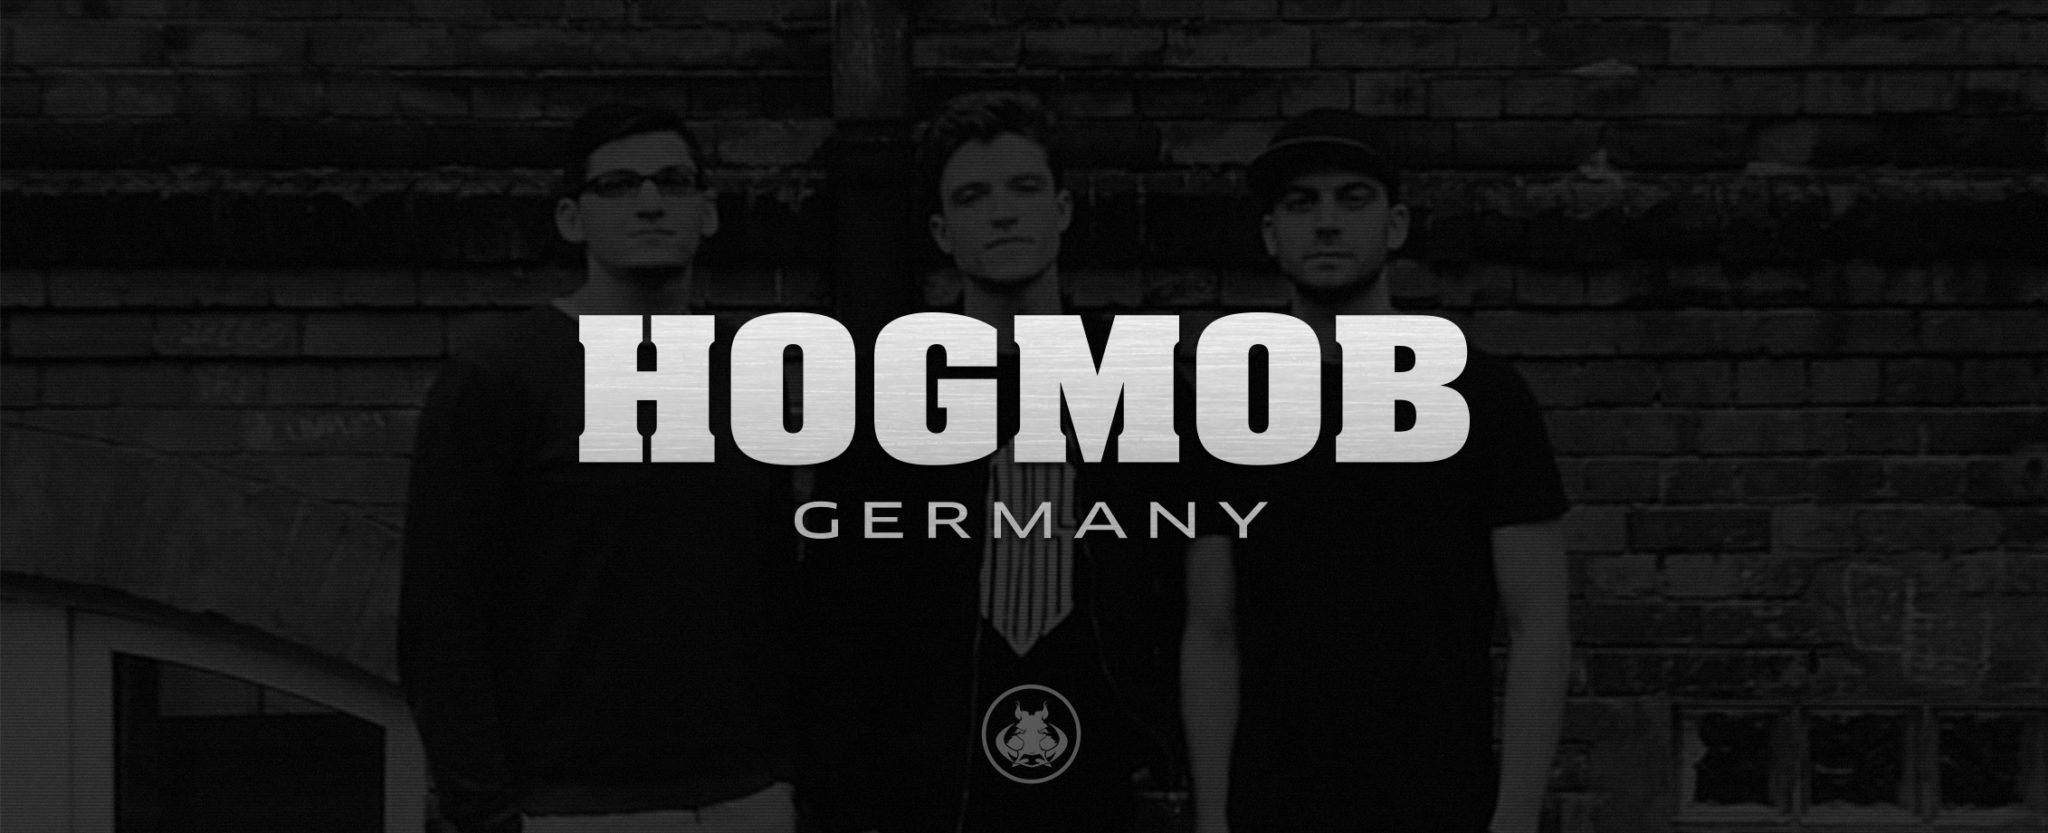 HogMob_Quer_Germany